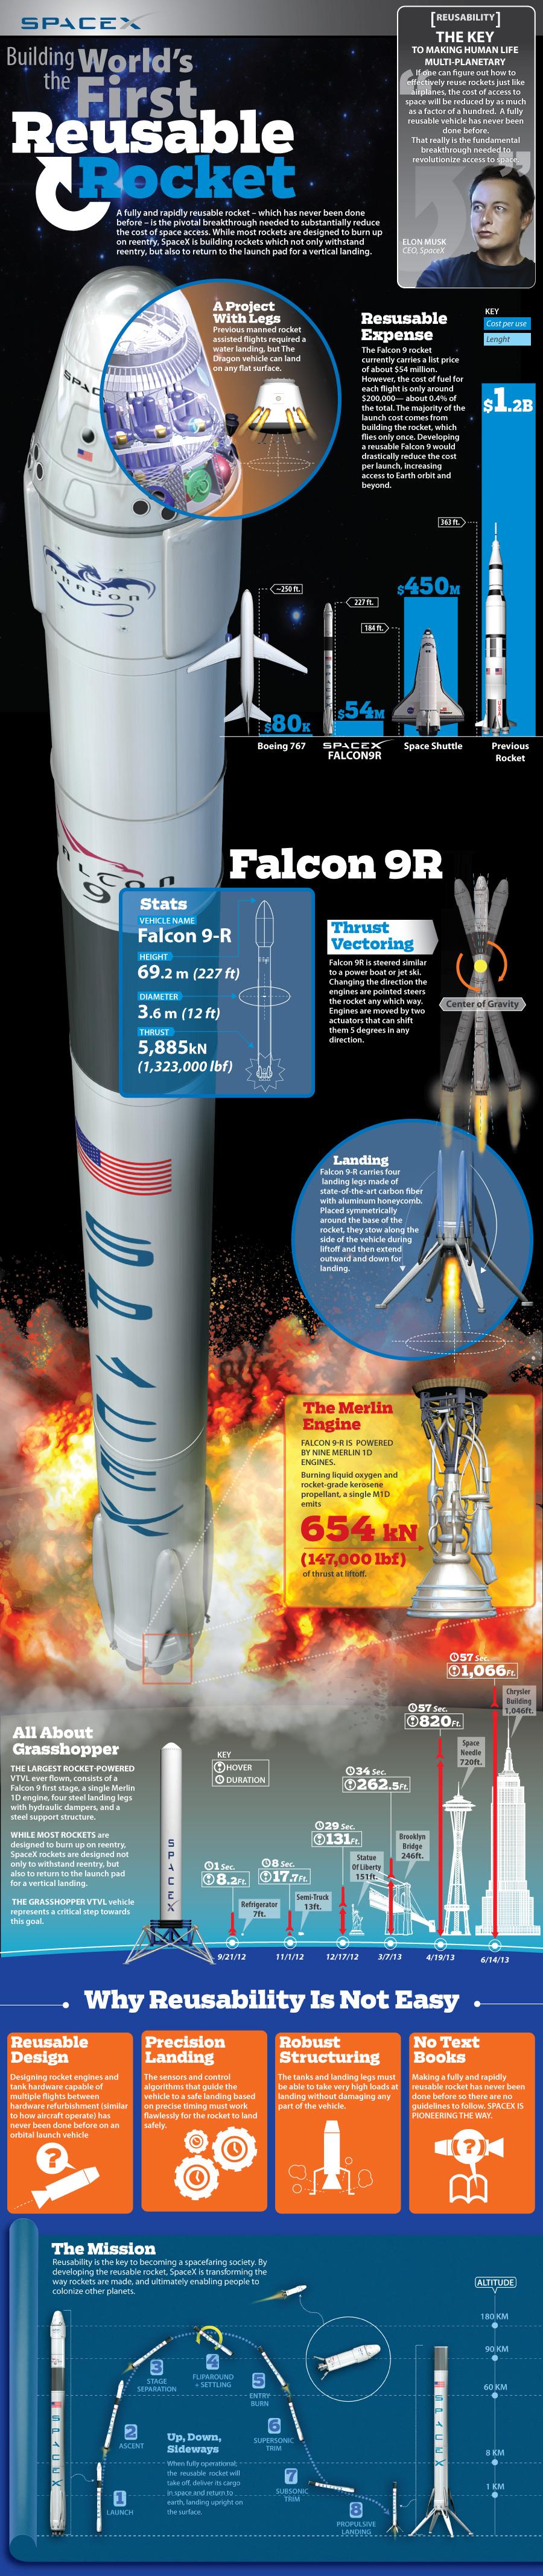 Reusable Rocket Technology